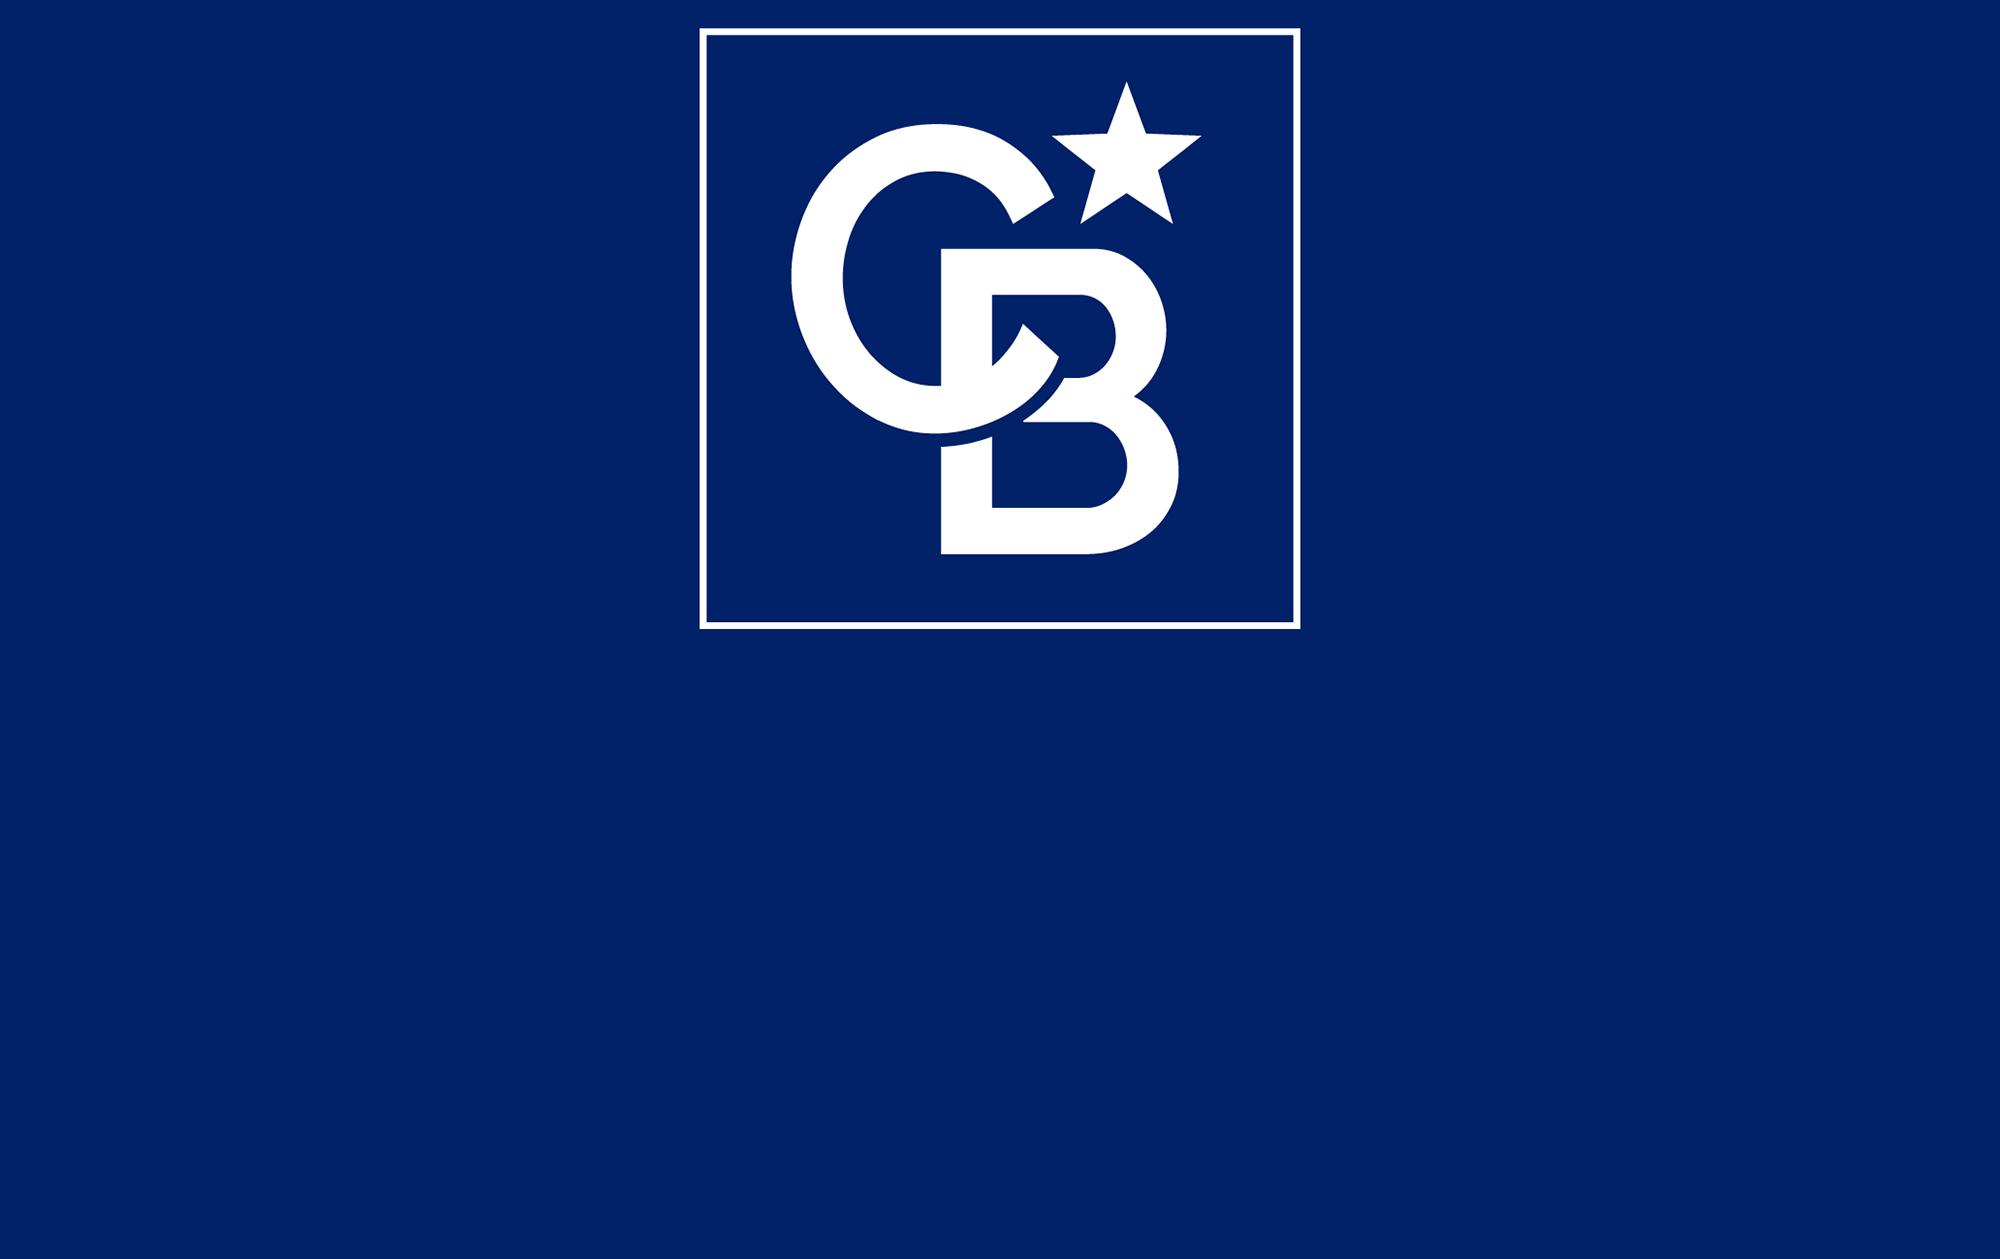 Joe Varlesi - Coldwell Banker Hubbell BriarWood Logo